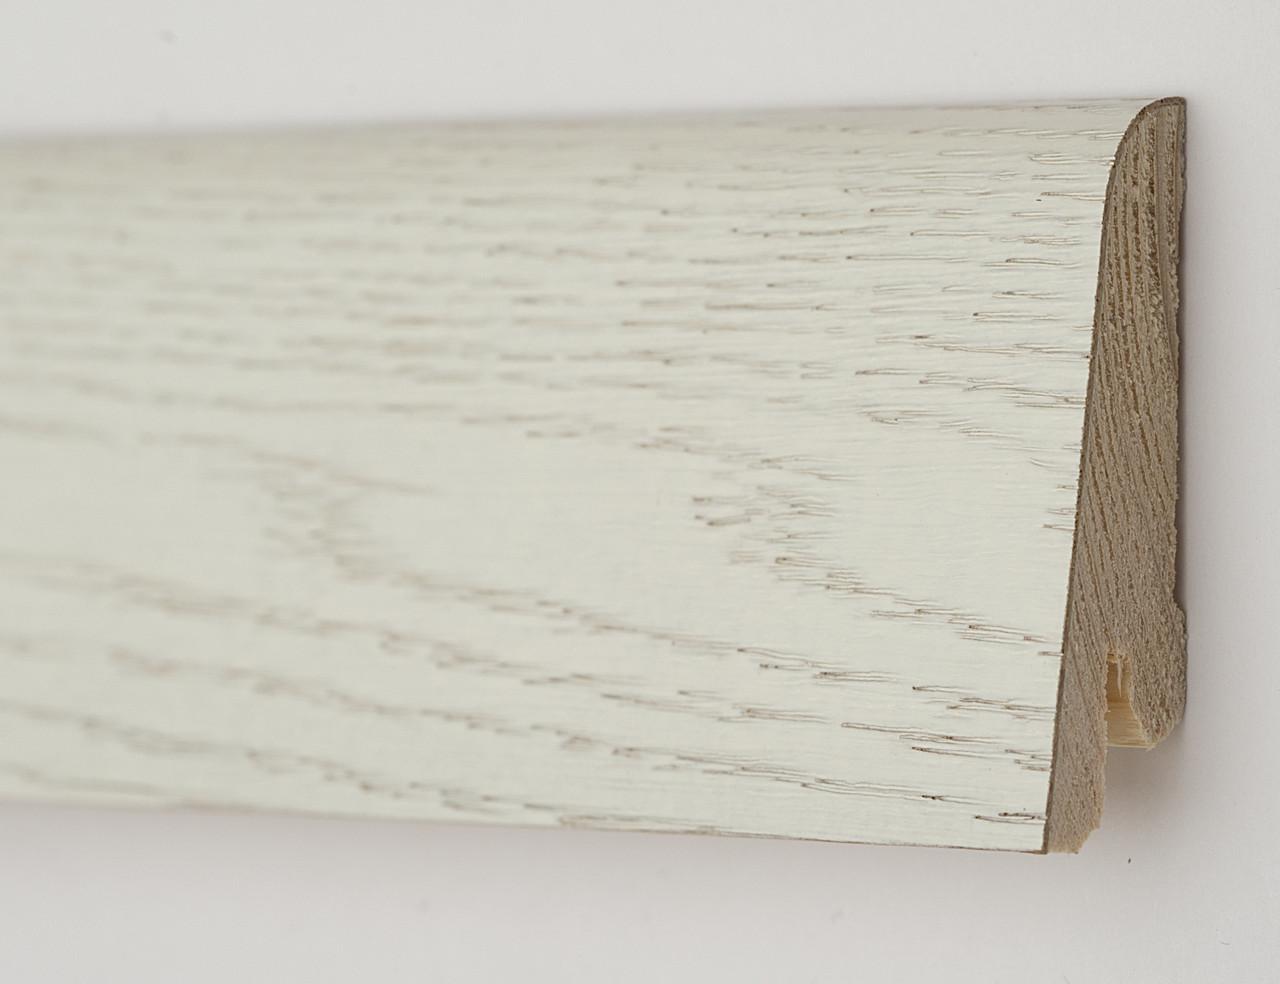 Плинтус деревянный (шпон) Kluchuk Neo Plinth Дуб Арктик 100х19х2200 мм.